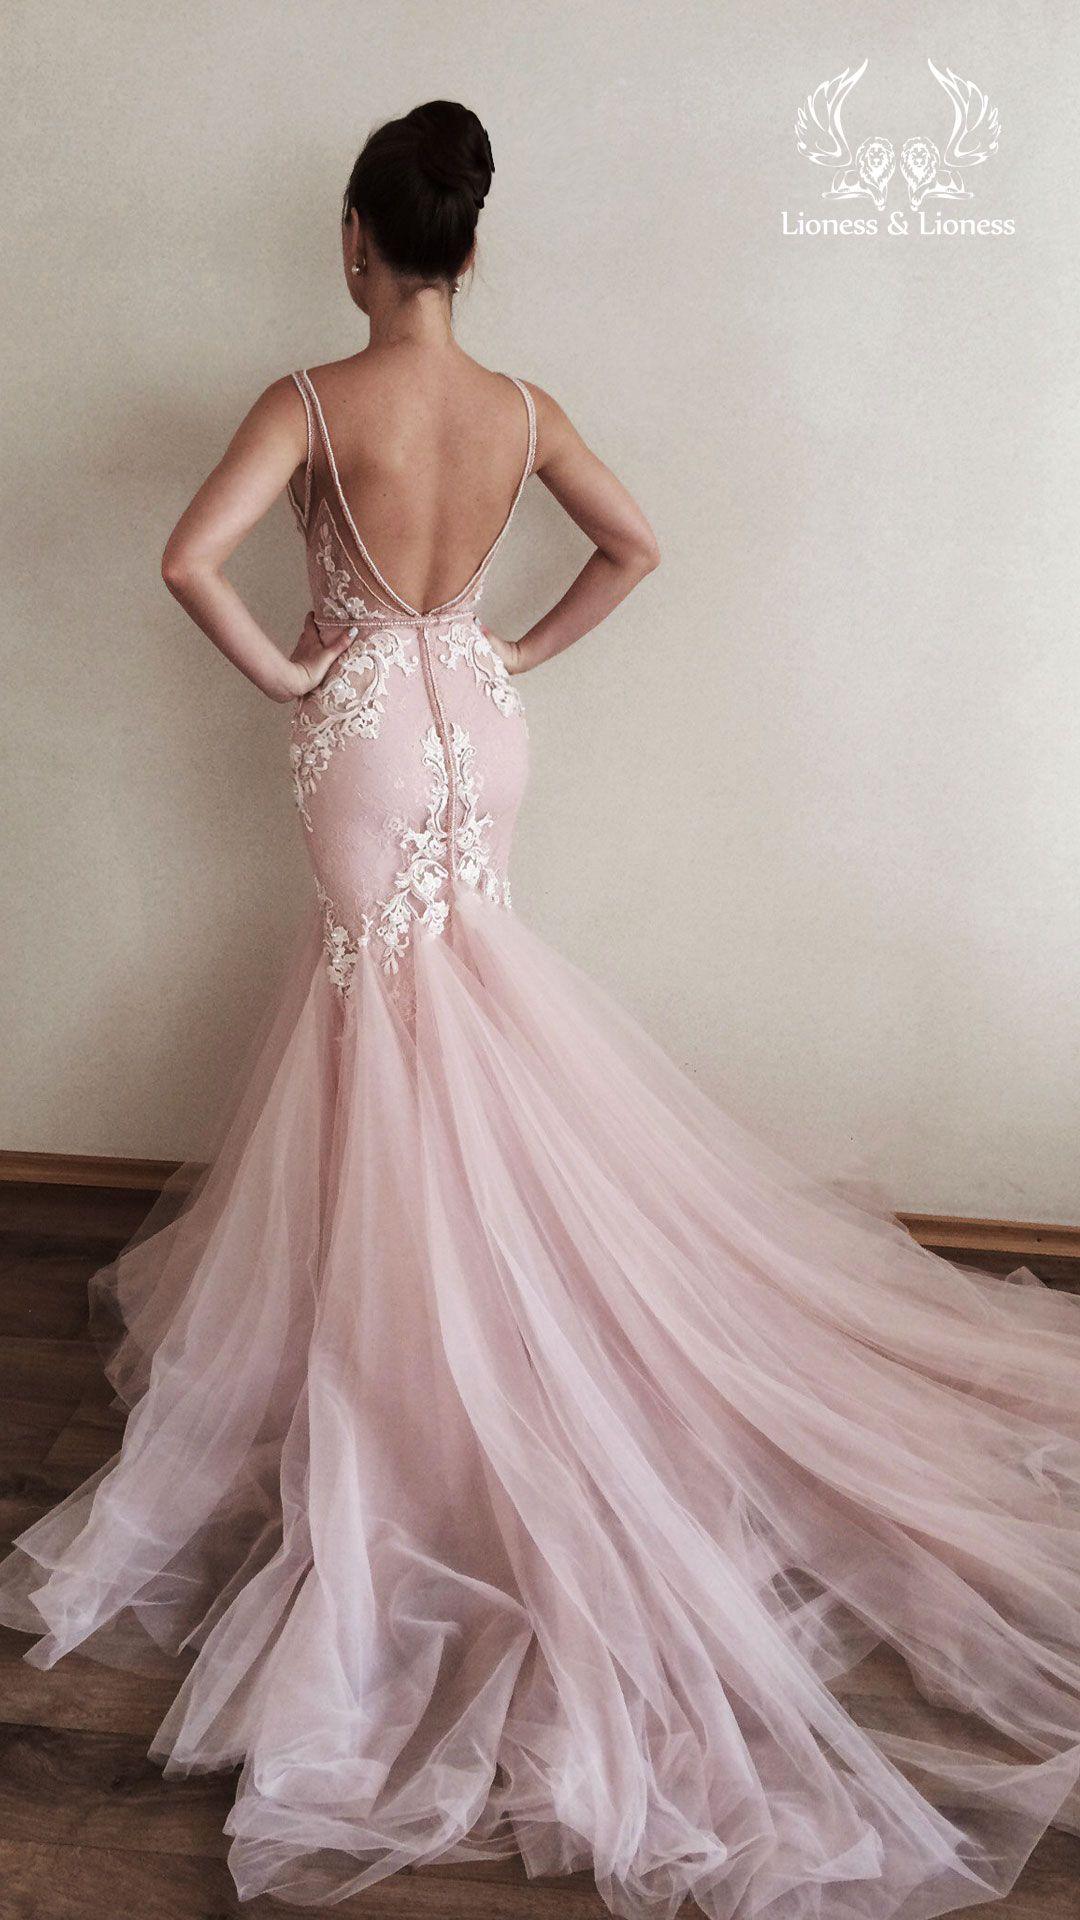 Pink Blush Lace Wedding Dress Mermaid Fluffy Removable Tulle Etsy Blush Wedding Dress Lace Pink Wedding Dresses Lace Mermaid Wedding Dress